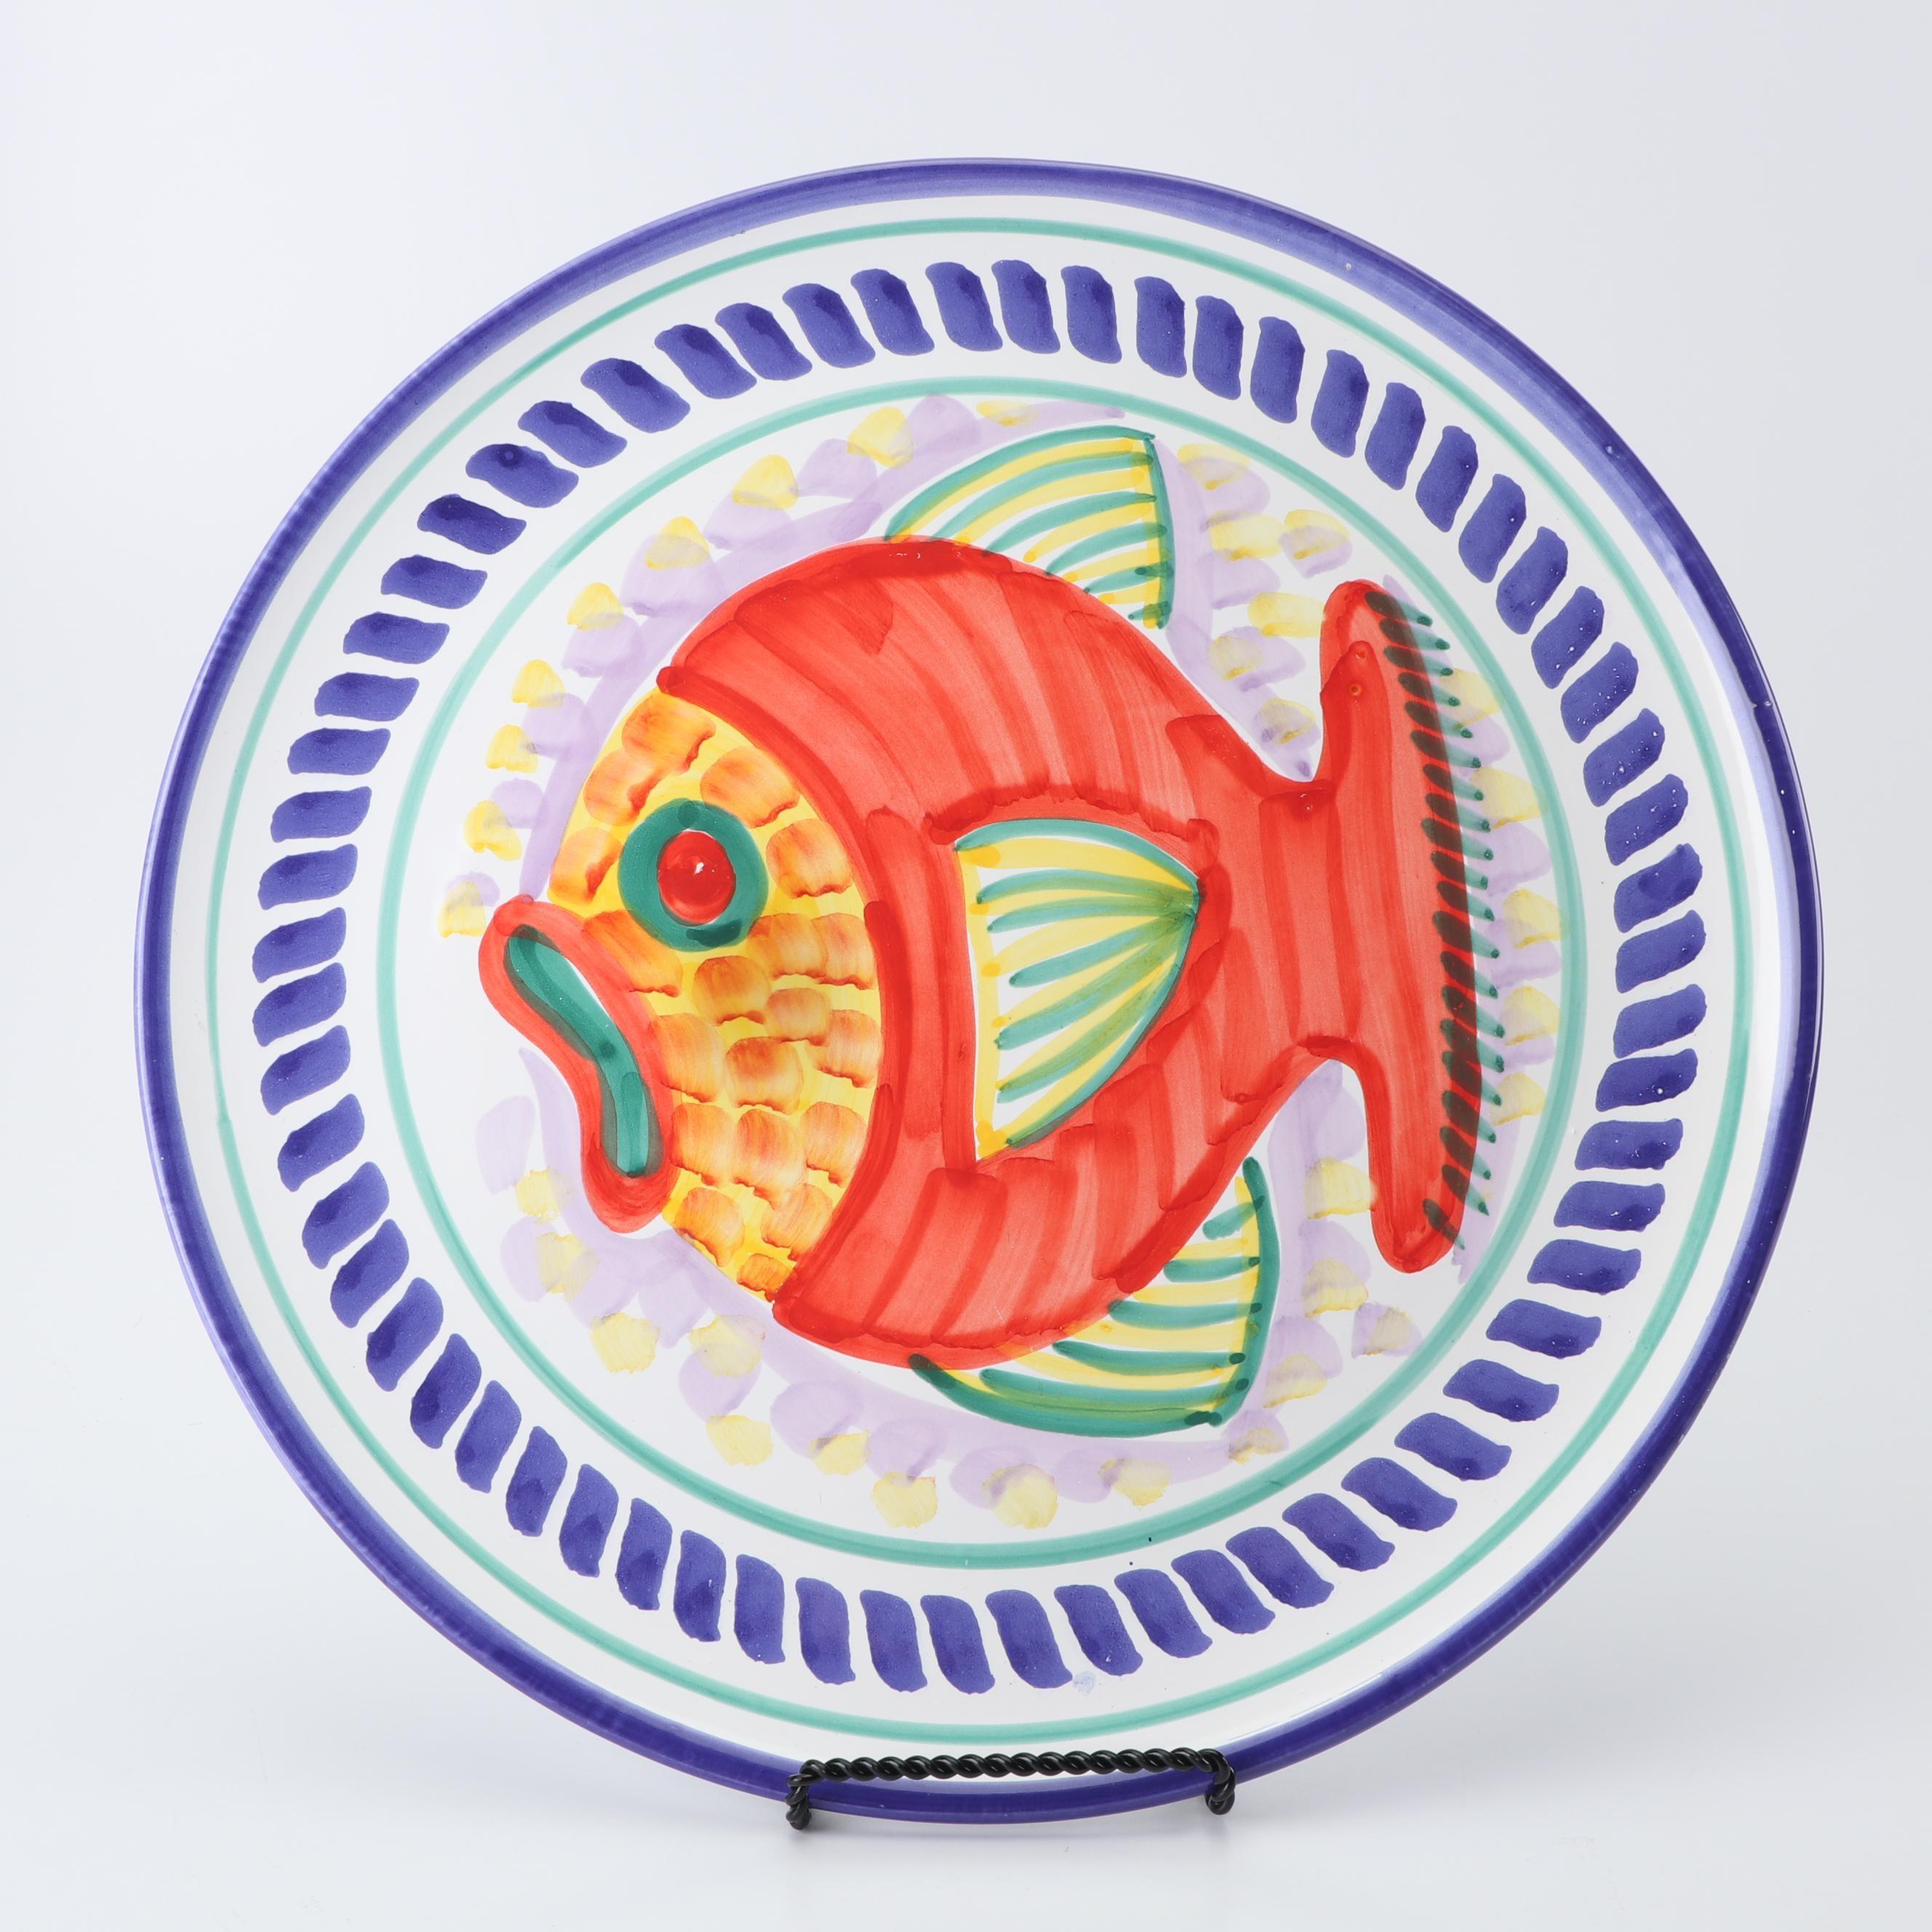 Italian Hand-Painted Ceramic Platter with Fish